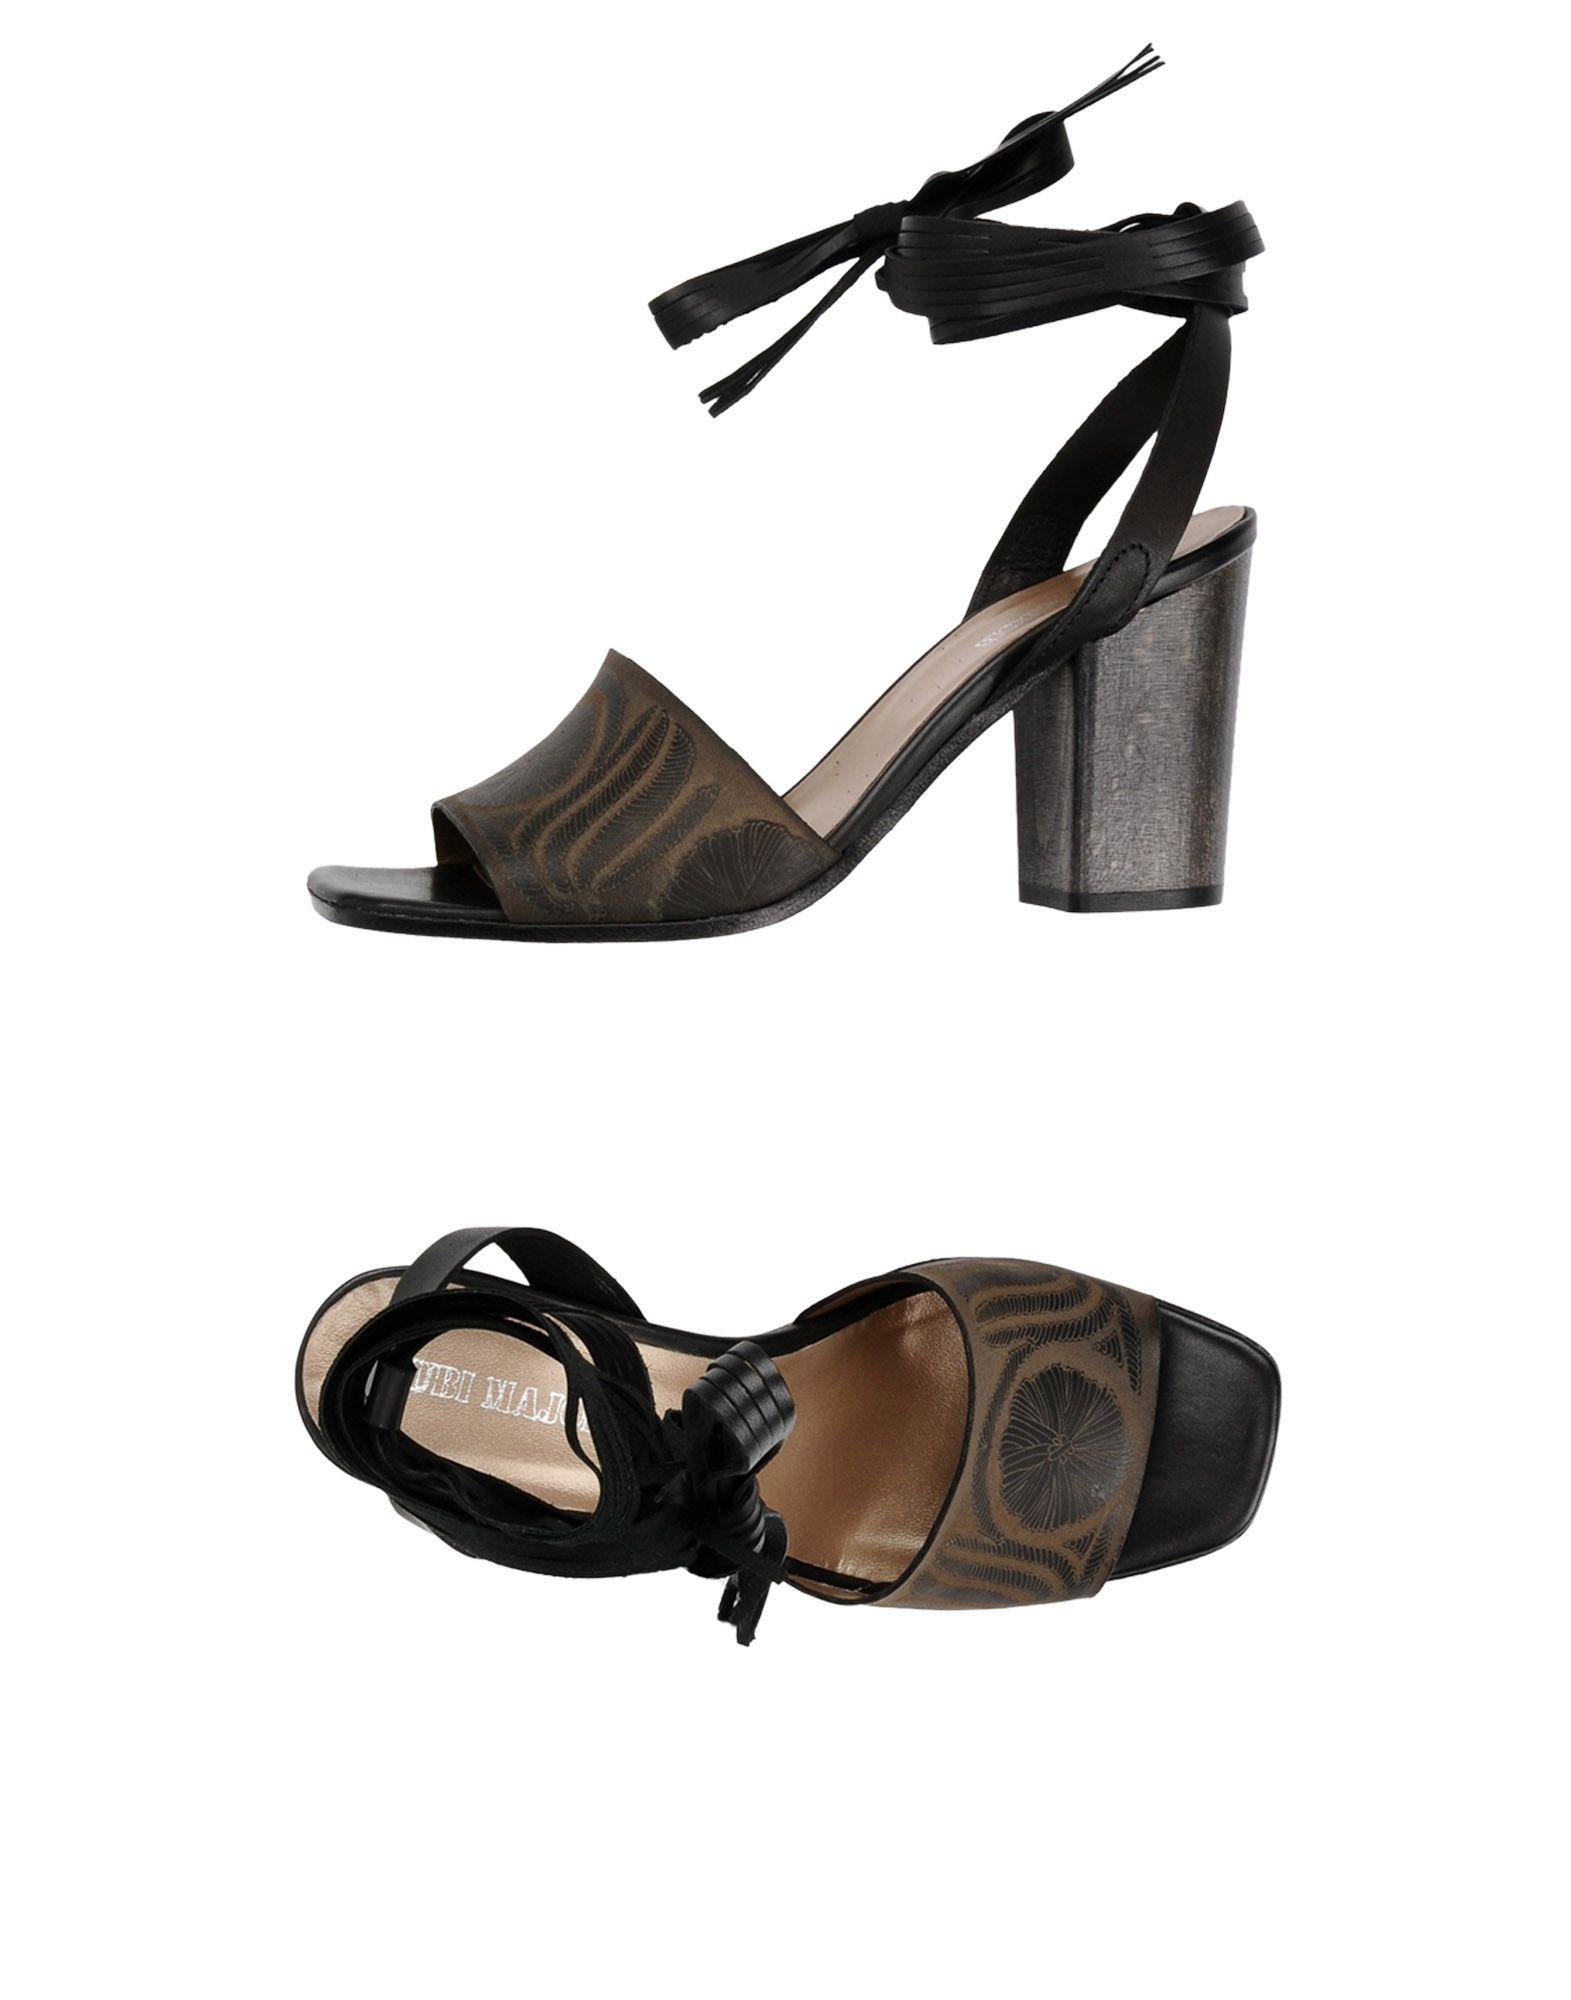 UBI MAJOR Damen Sandale Farbe Khaki Größe 9 jetztbilligerkaufen